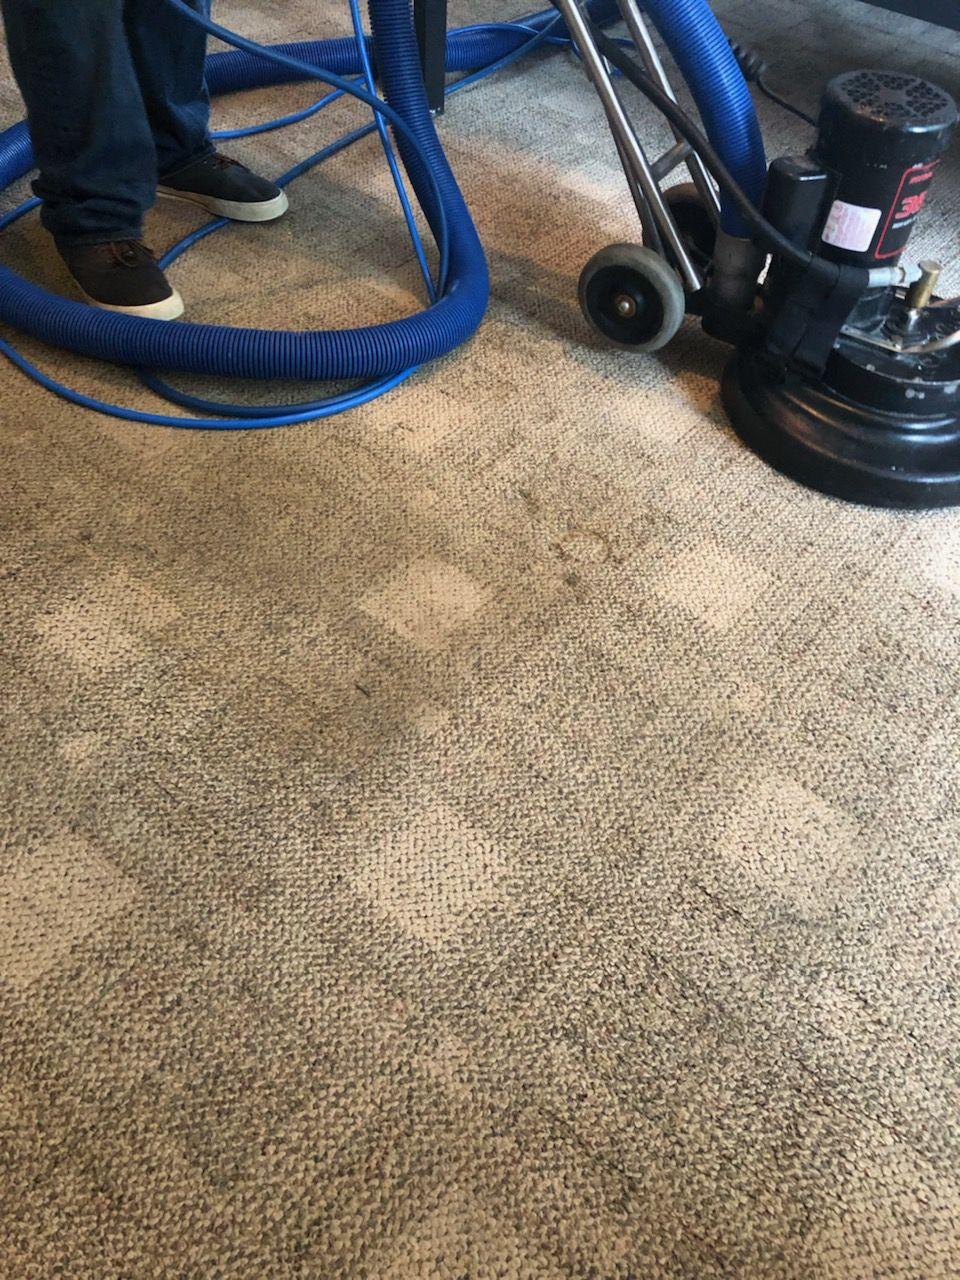 Carpet Restoration In Memphis Tn Carpet Steam How To Clean Carpet Carpet Cleaning Company